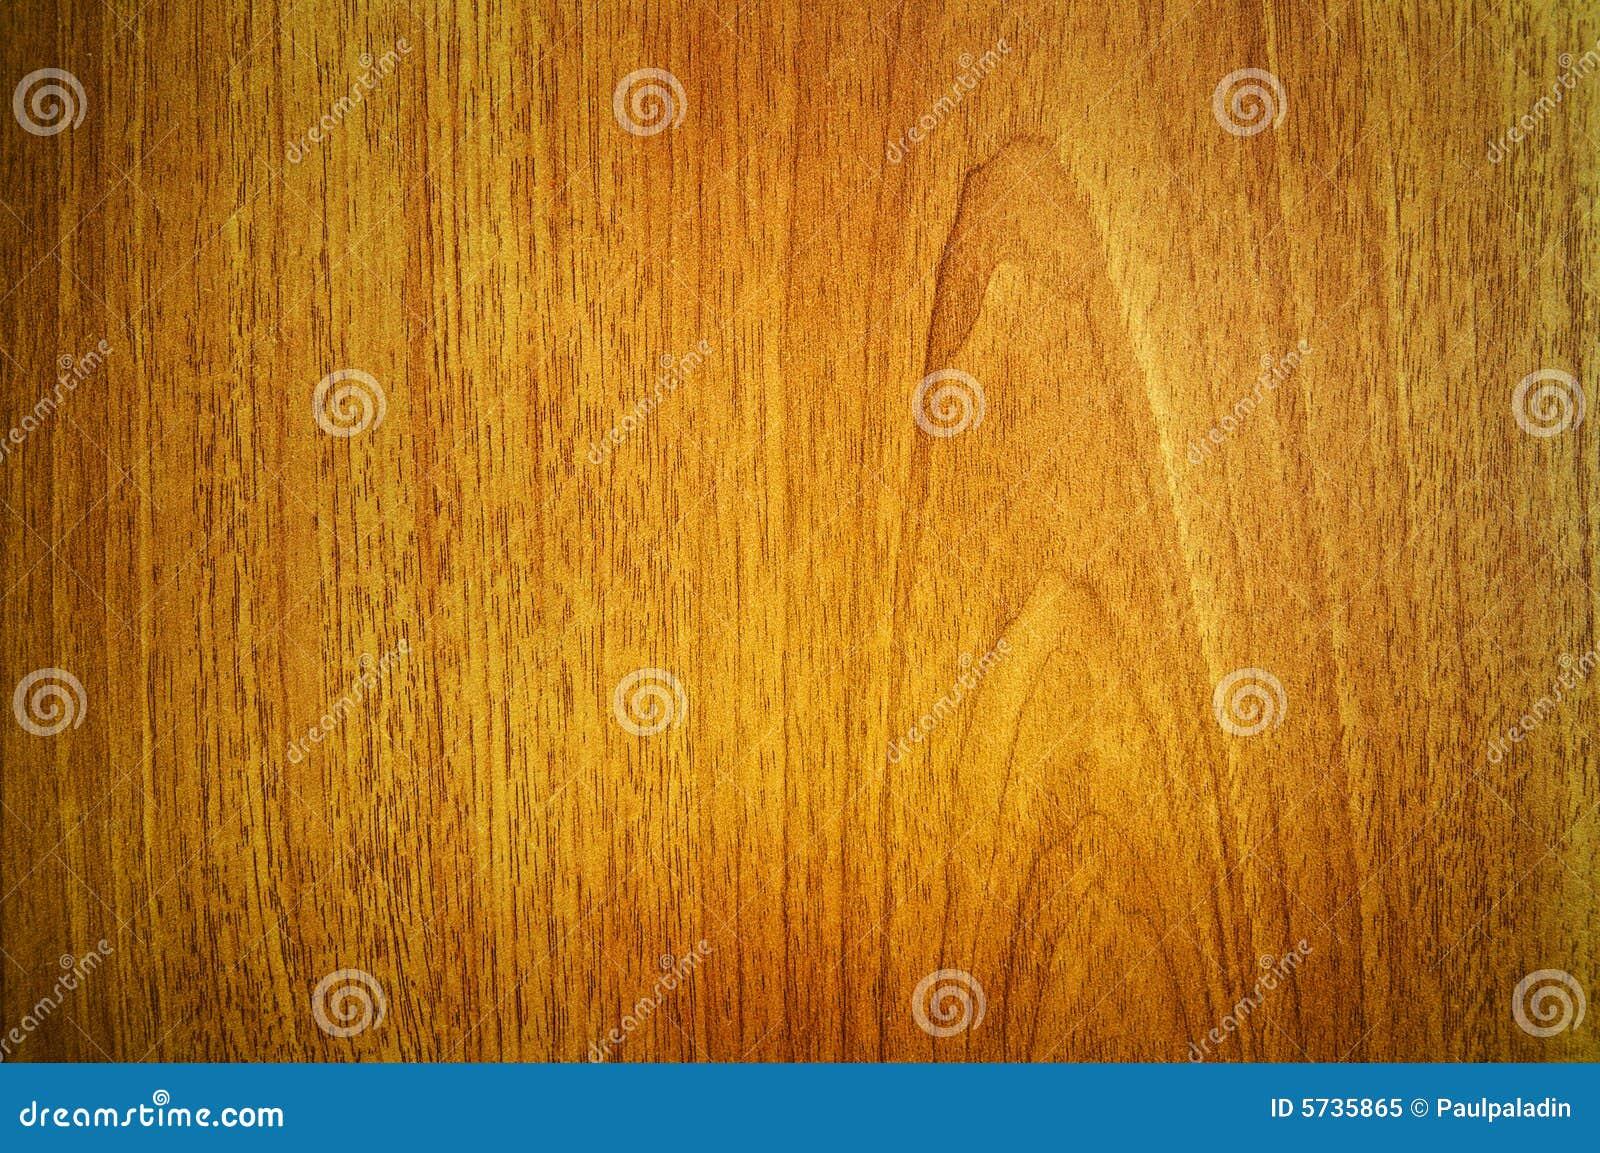 Maple wood texture stock image of lumber